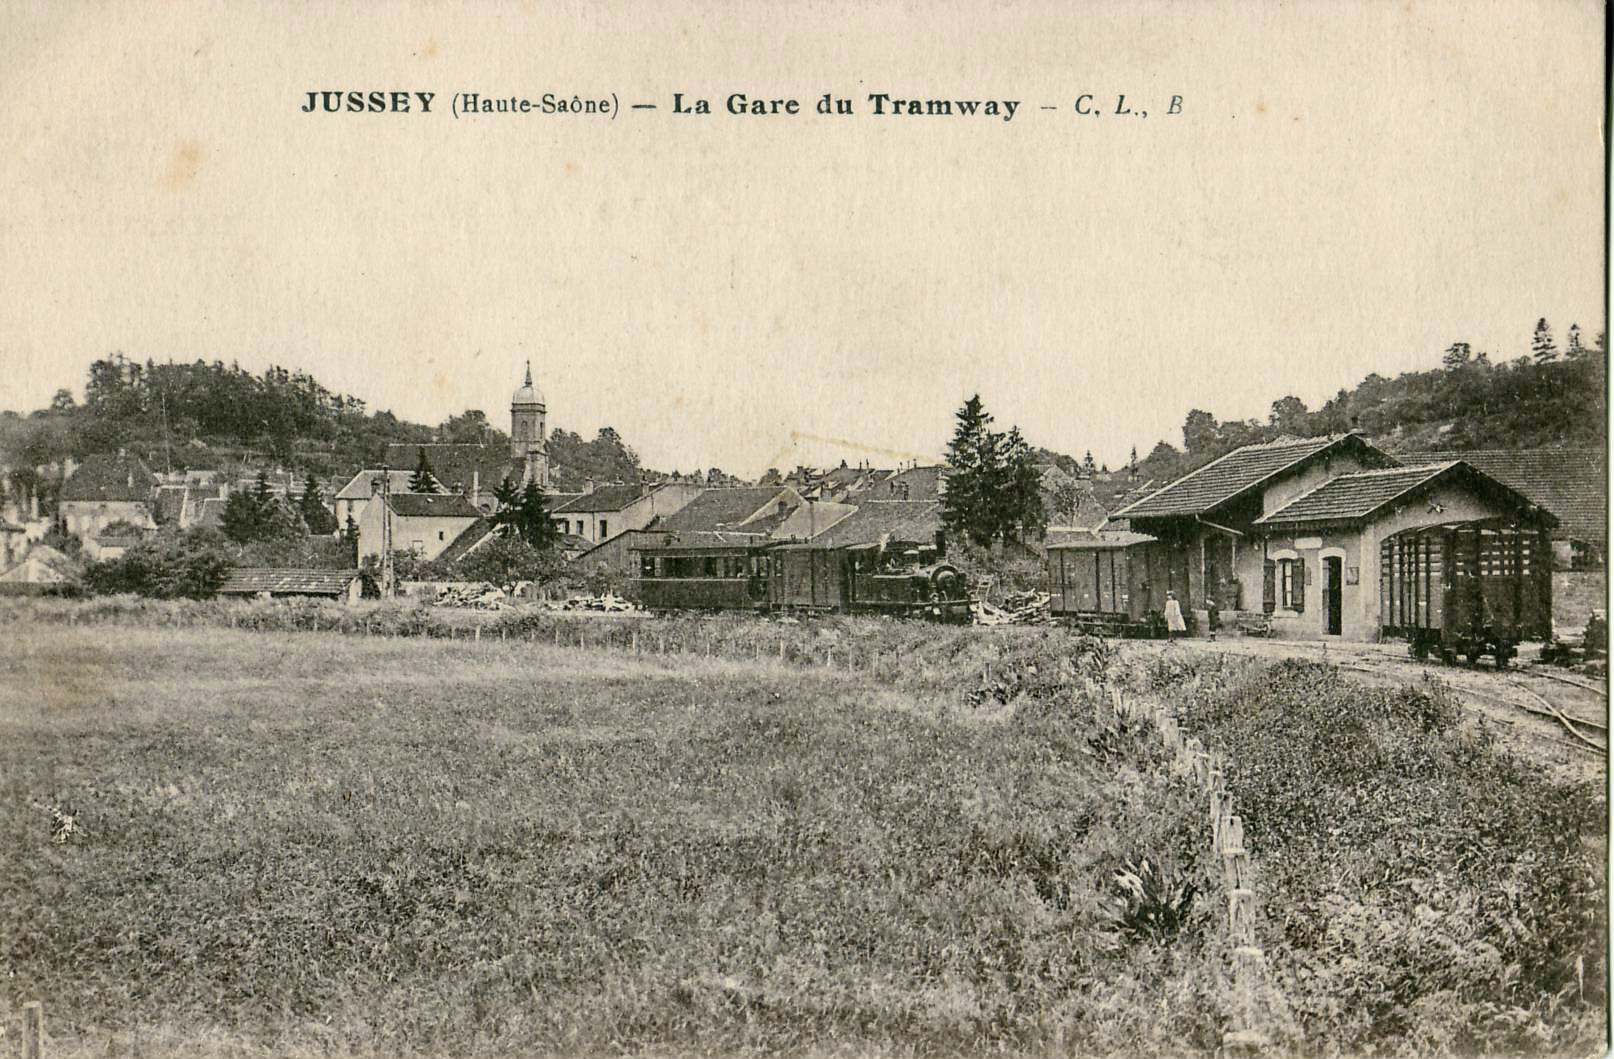 CL B - JUSSEY - La Gare du Tramway.JPG